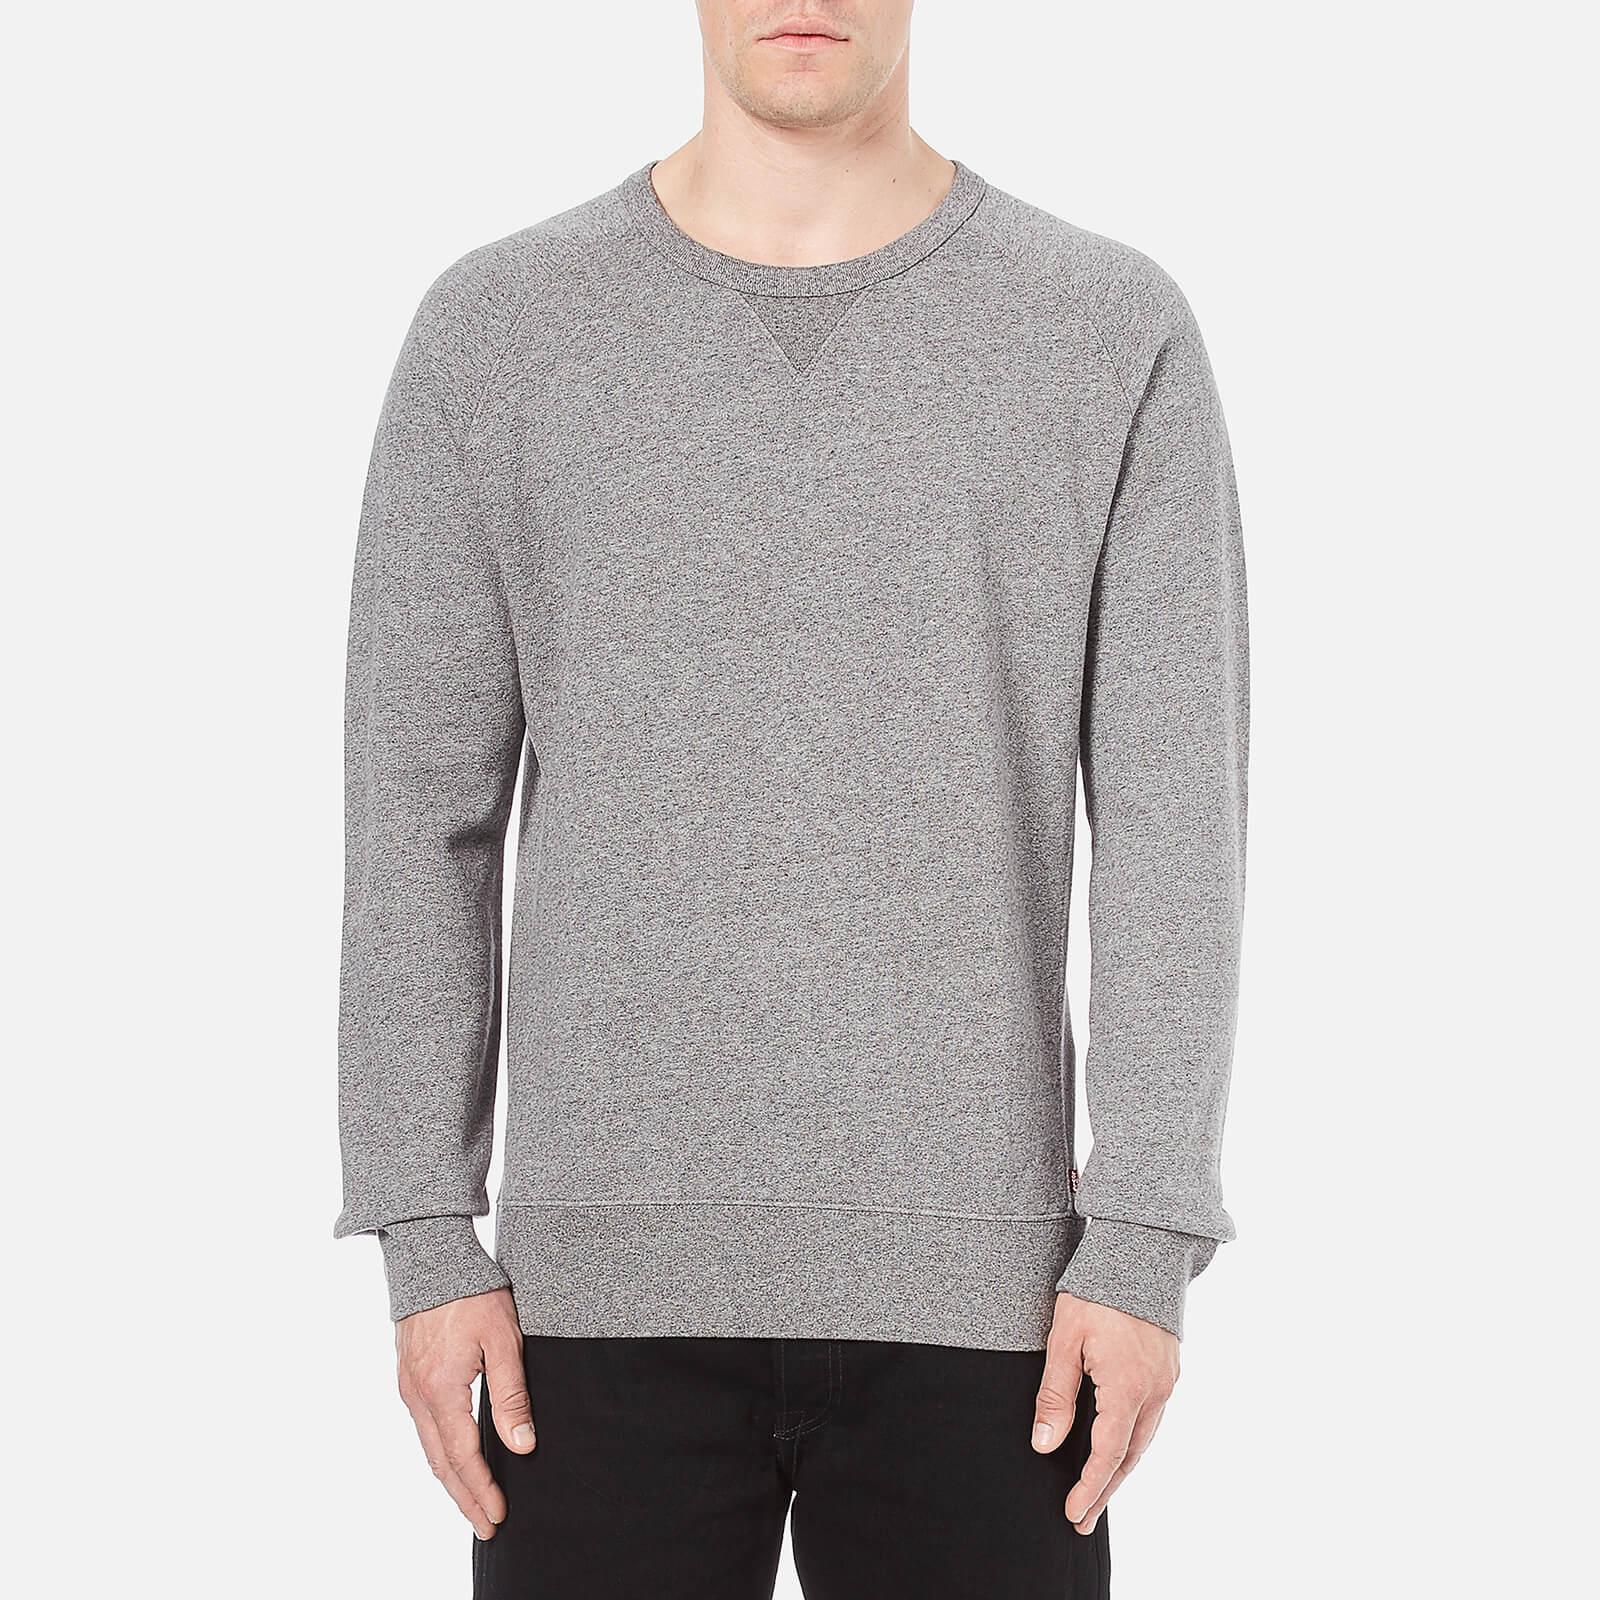 680273e0f5 Levi's Men's Original Crew Neck Sweatshirt - Medium Grey Heather Mens  Clothing | TheHut.com